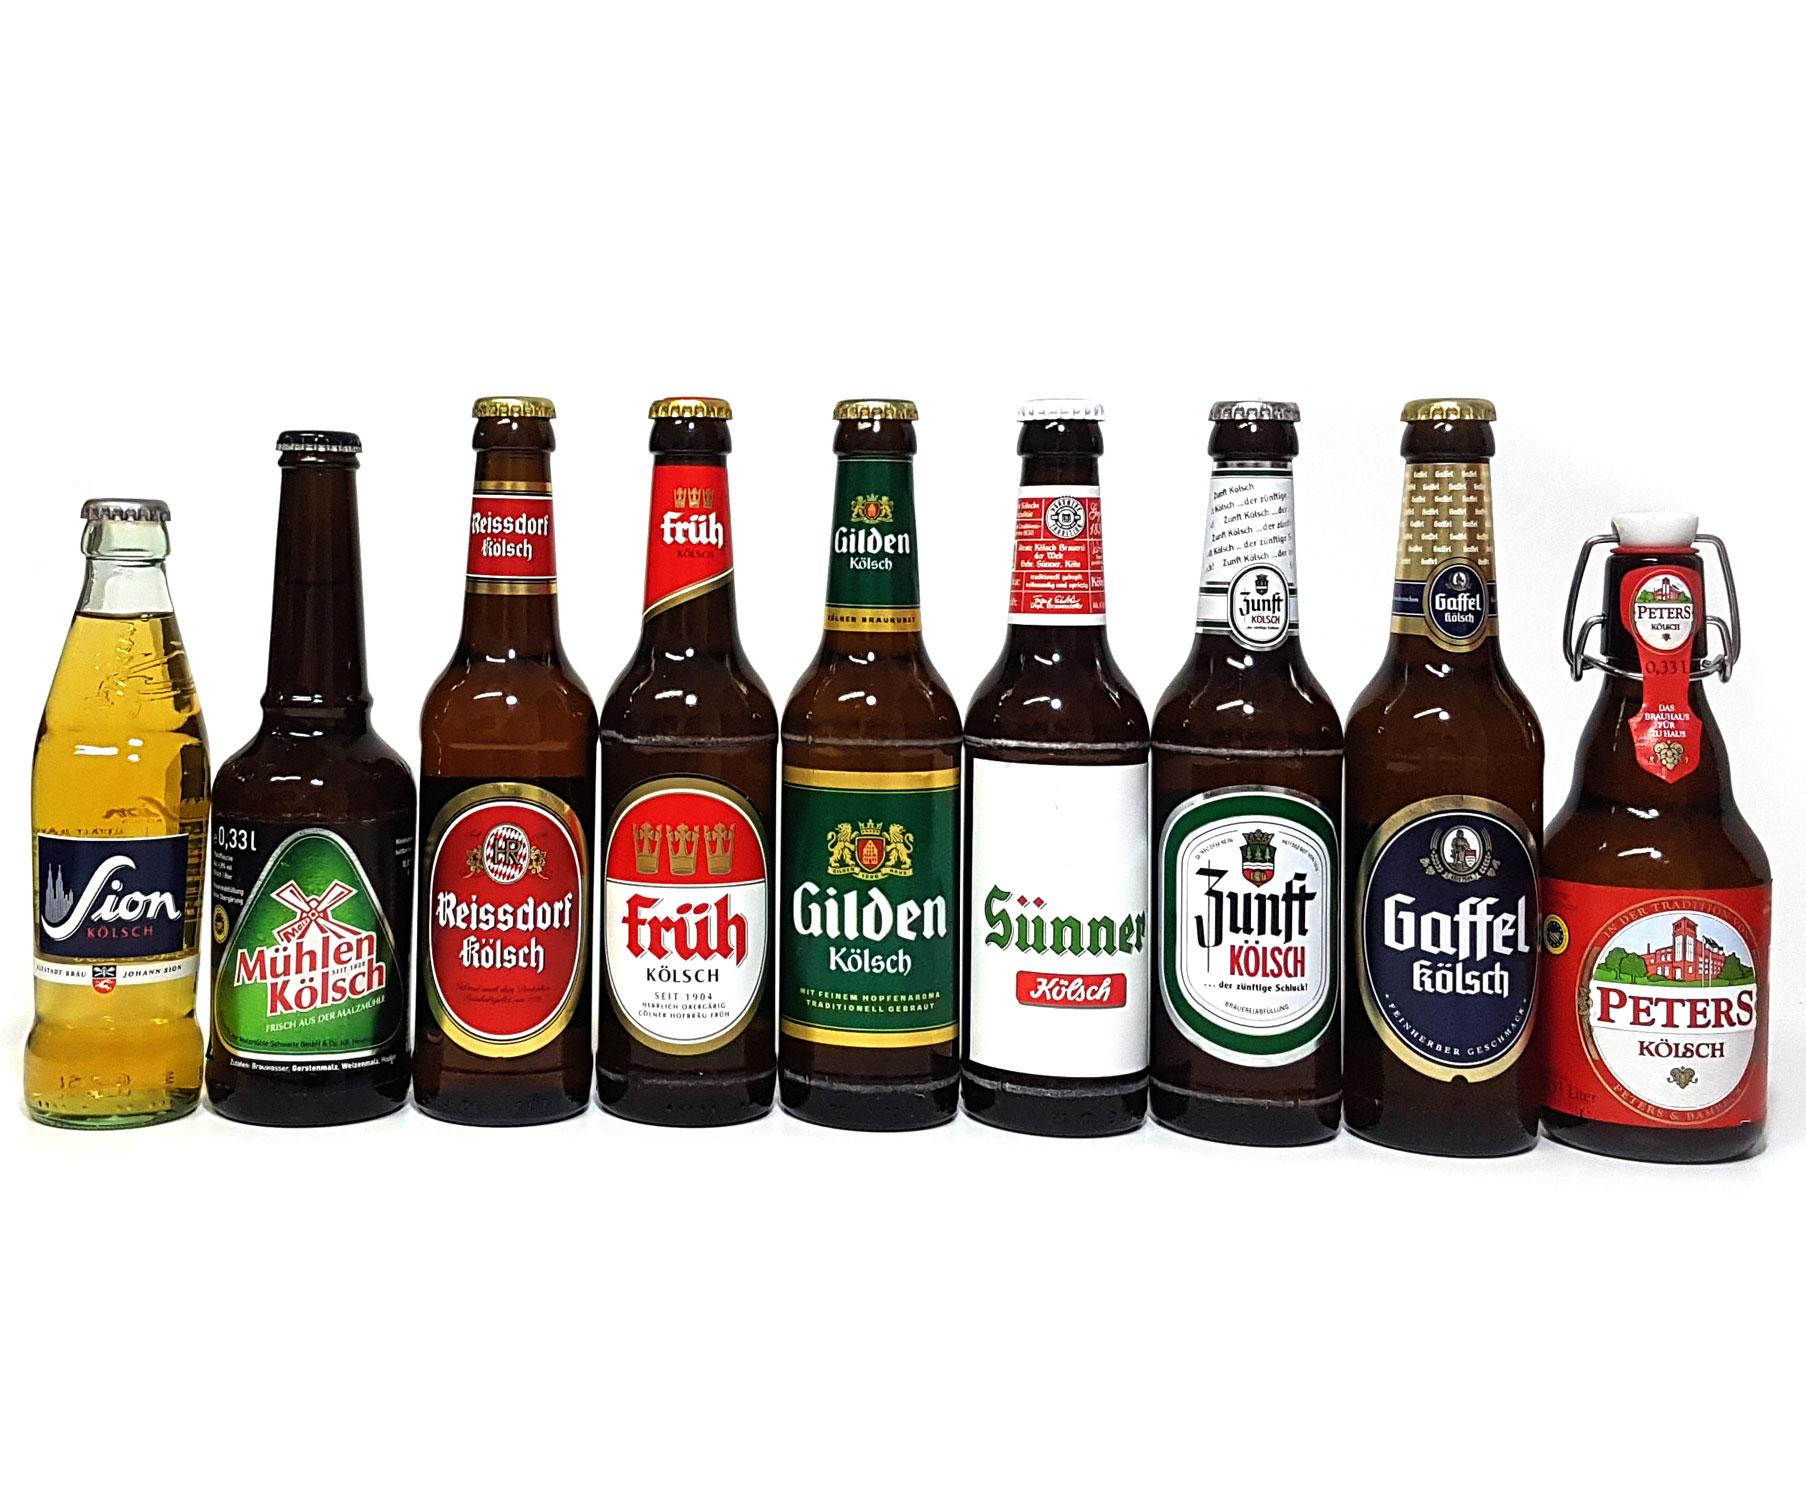 Kölsch 9er Bier Set - Sion 0,25L (4,8% Vol.) + Mühlen (4,8% Vol) + Zunft (4,8% Vol.) + Gaffel (4,8% Vol) + Früh (4,8% Vol.) + Gilden (4,8% Vol.) + Reissdorf (4,8% Vol.) + Peters (4,8% Vol) + Sünner (4,8% Vol) - je 0,33L